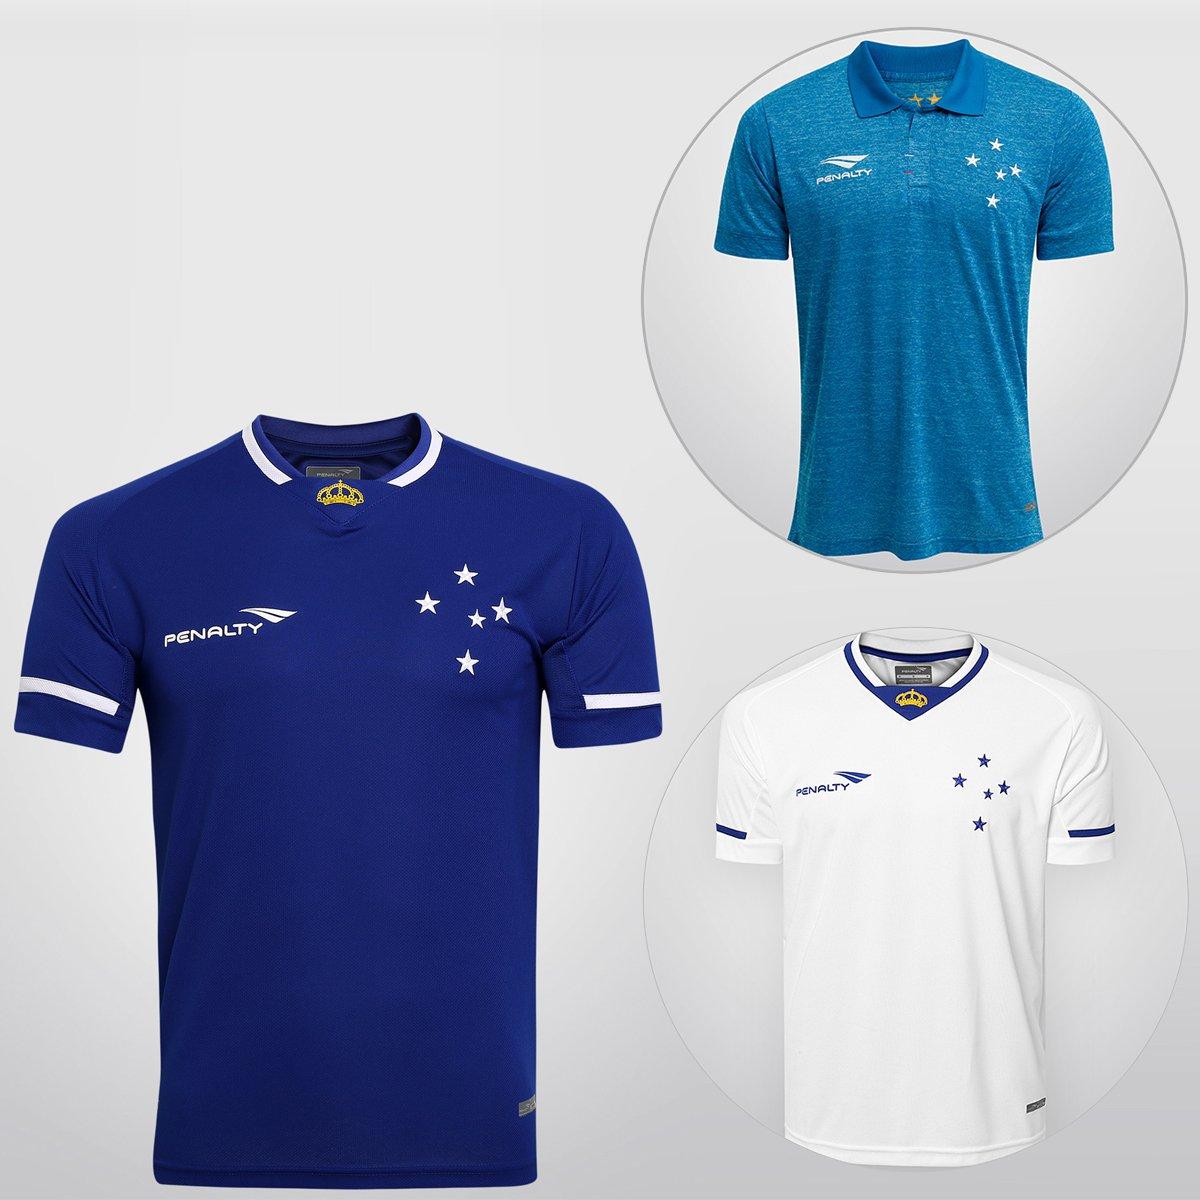 d325e3f3acbf4 Super Kit Penalty Cruzeiro - Camisa I 15 16 s nº + Camisa II 15 16 s nº + Camisa  III 15 16 s nº - Compre Agora